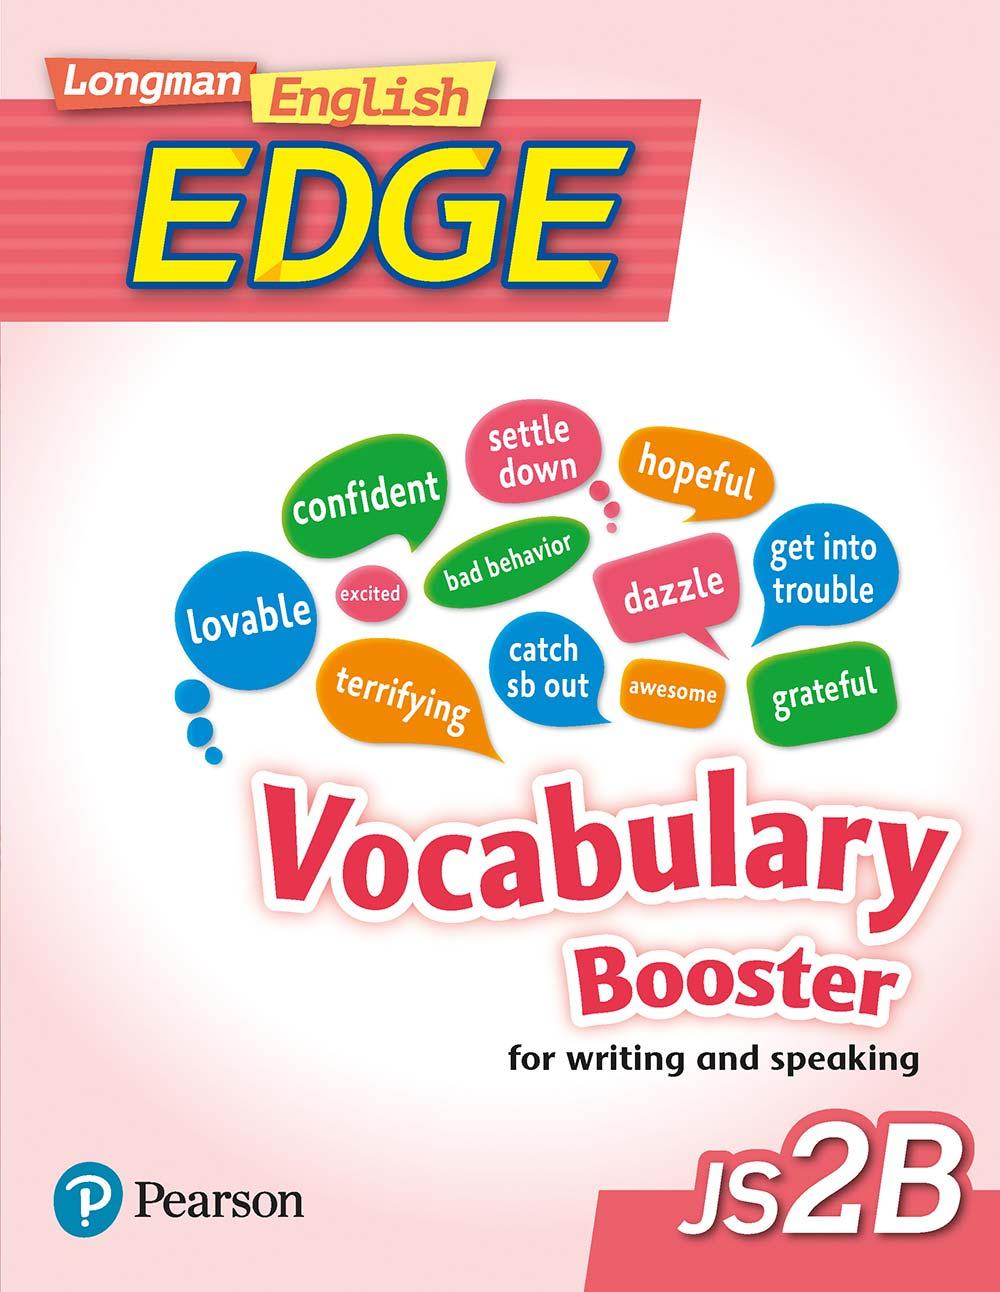 Longman English Edge JS2B Vocabulary Booster